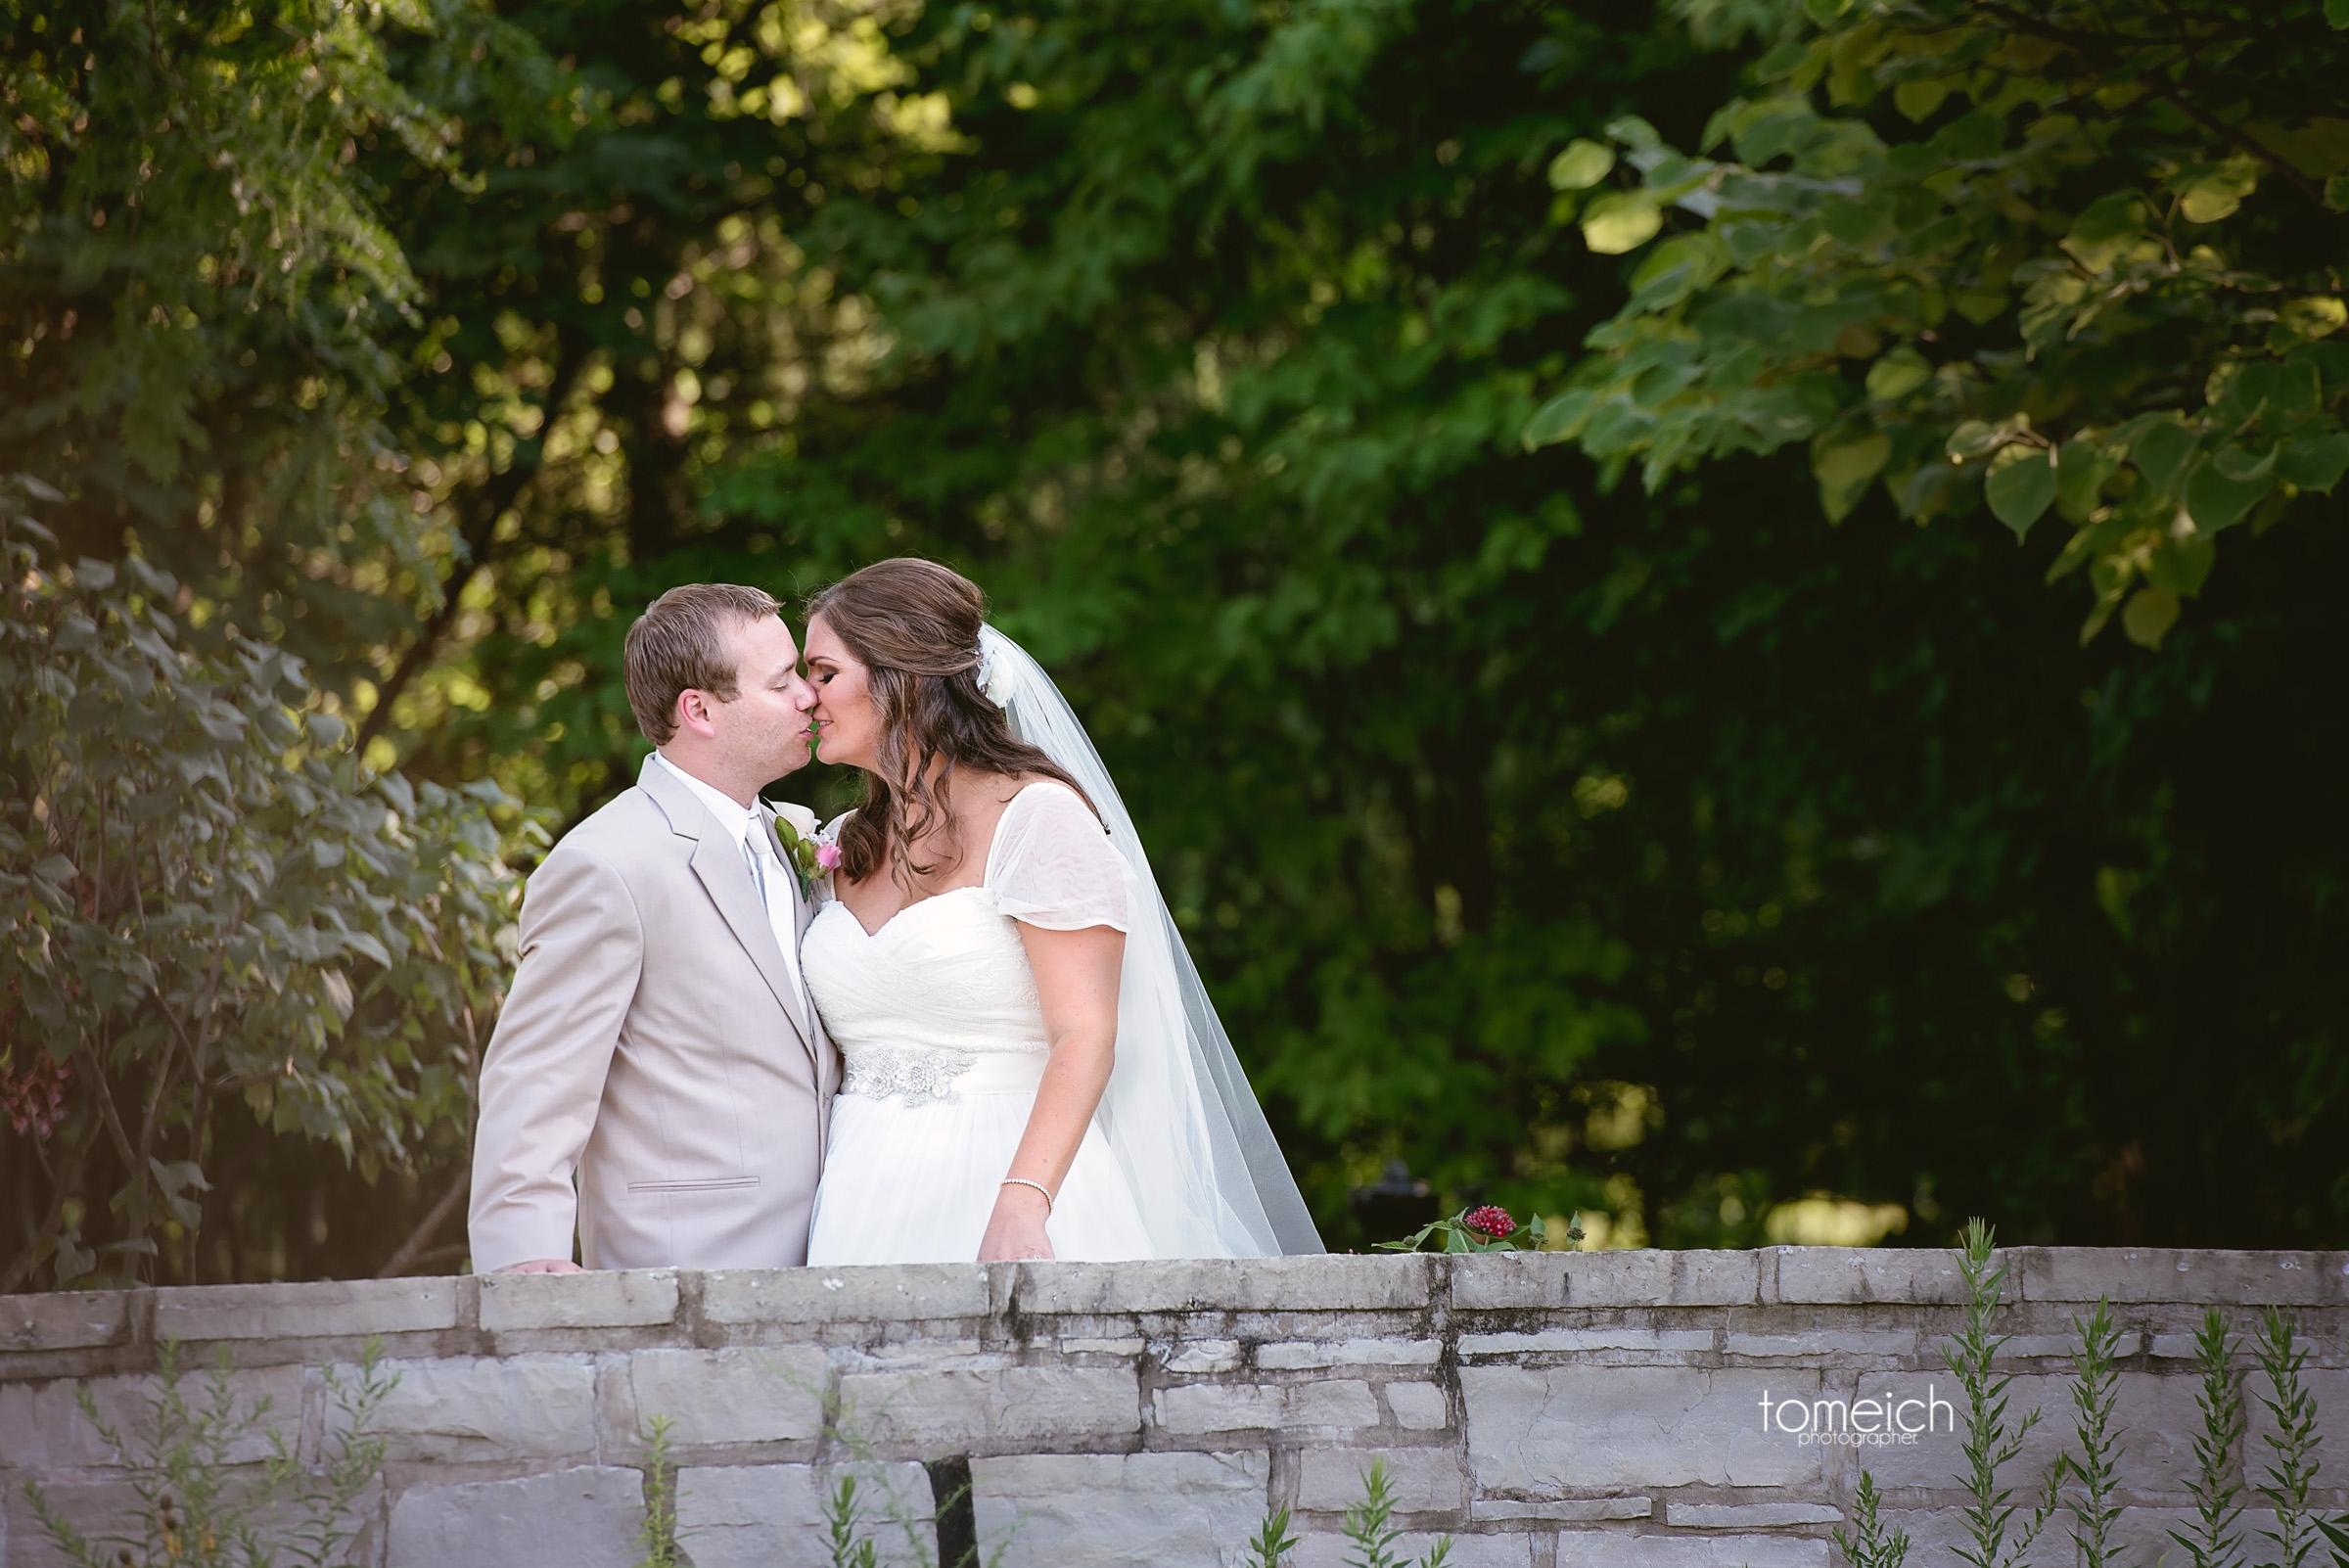 butterfly house wedding chesterfield-22.jpg